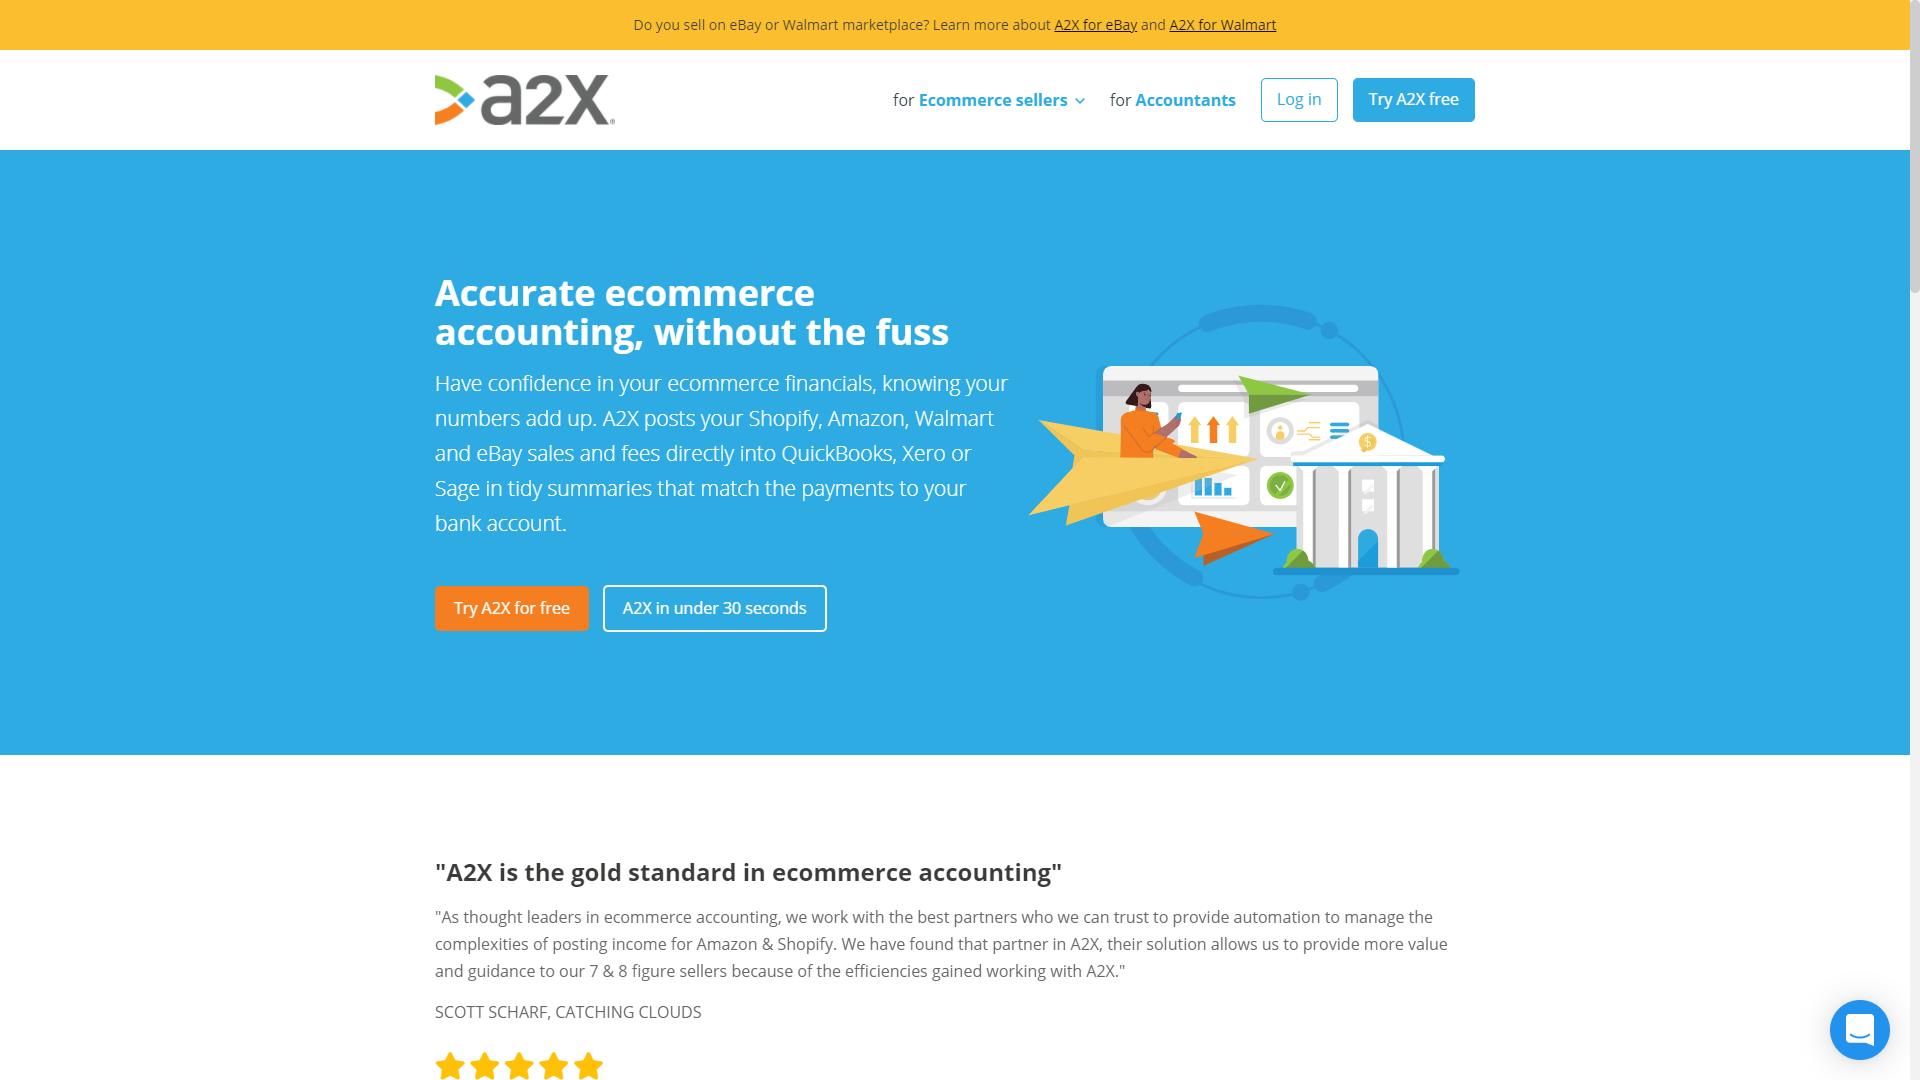 A2X for Amazon - Seller Spaceship